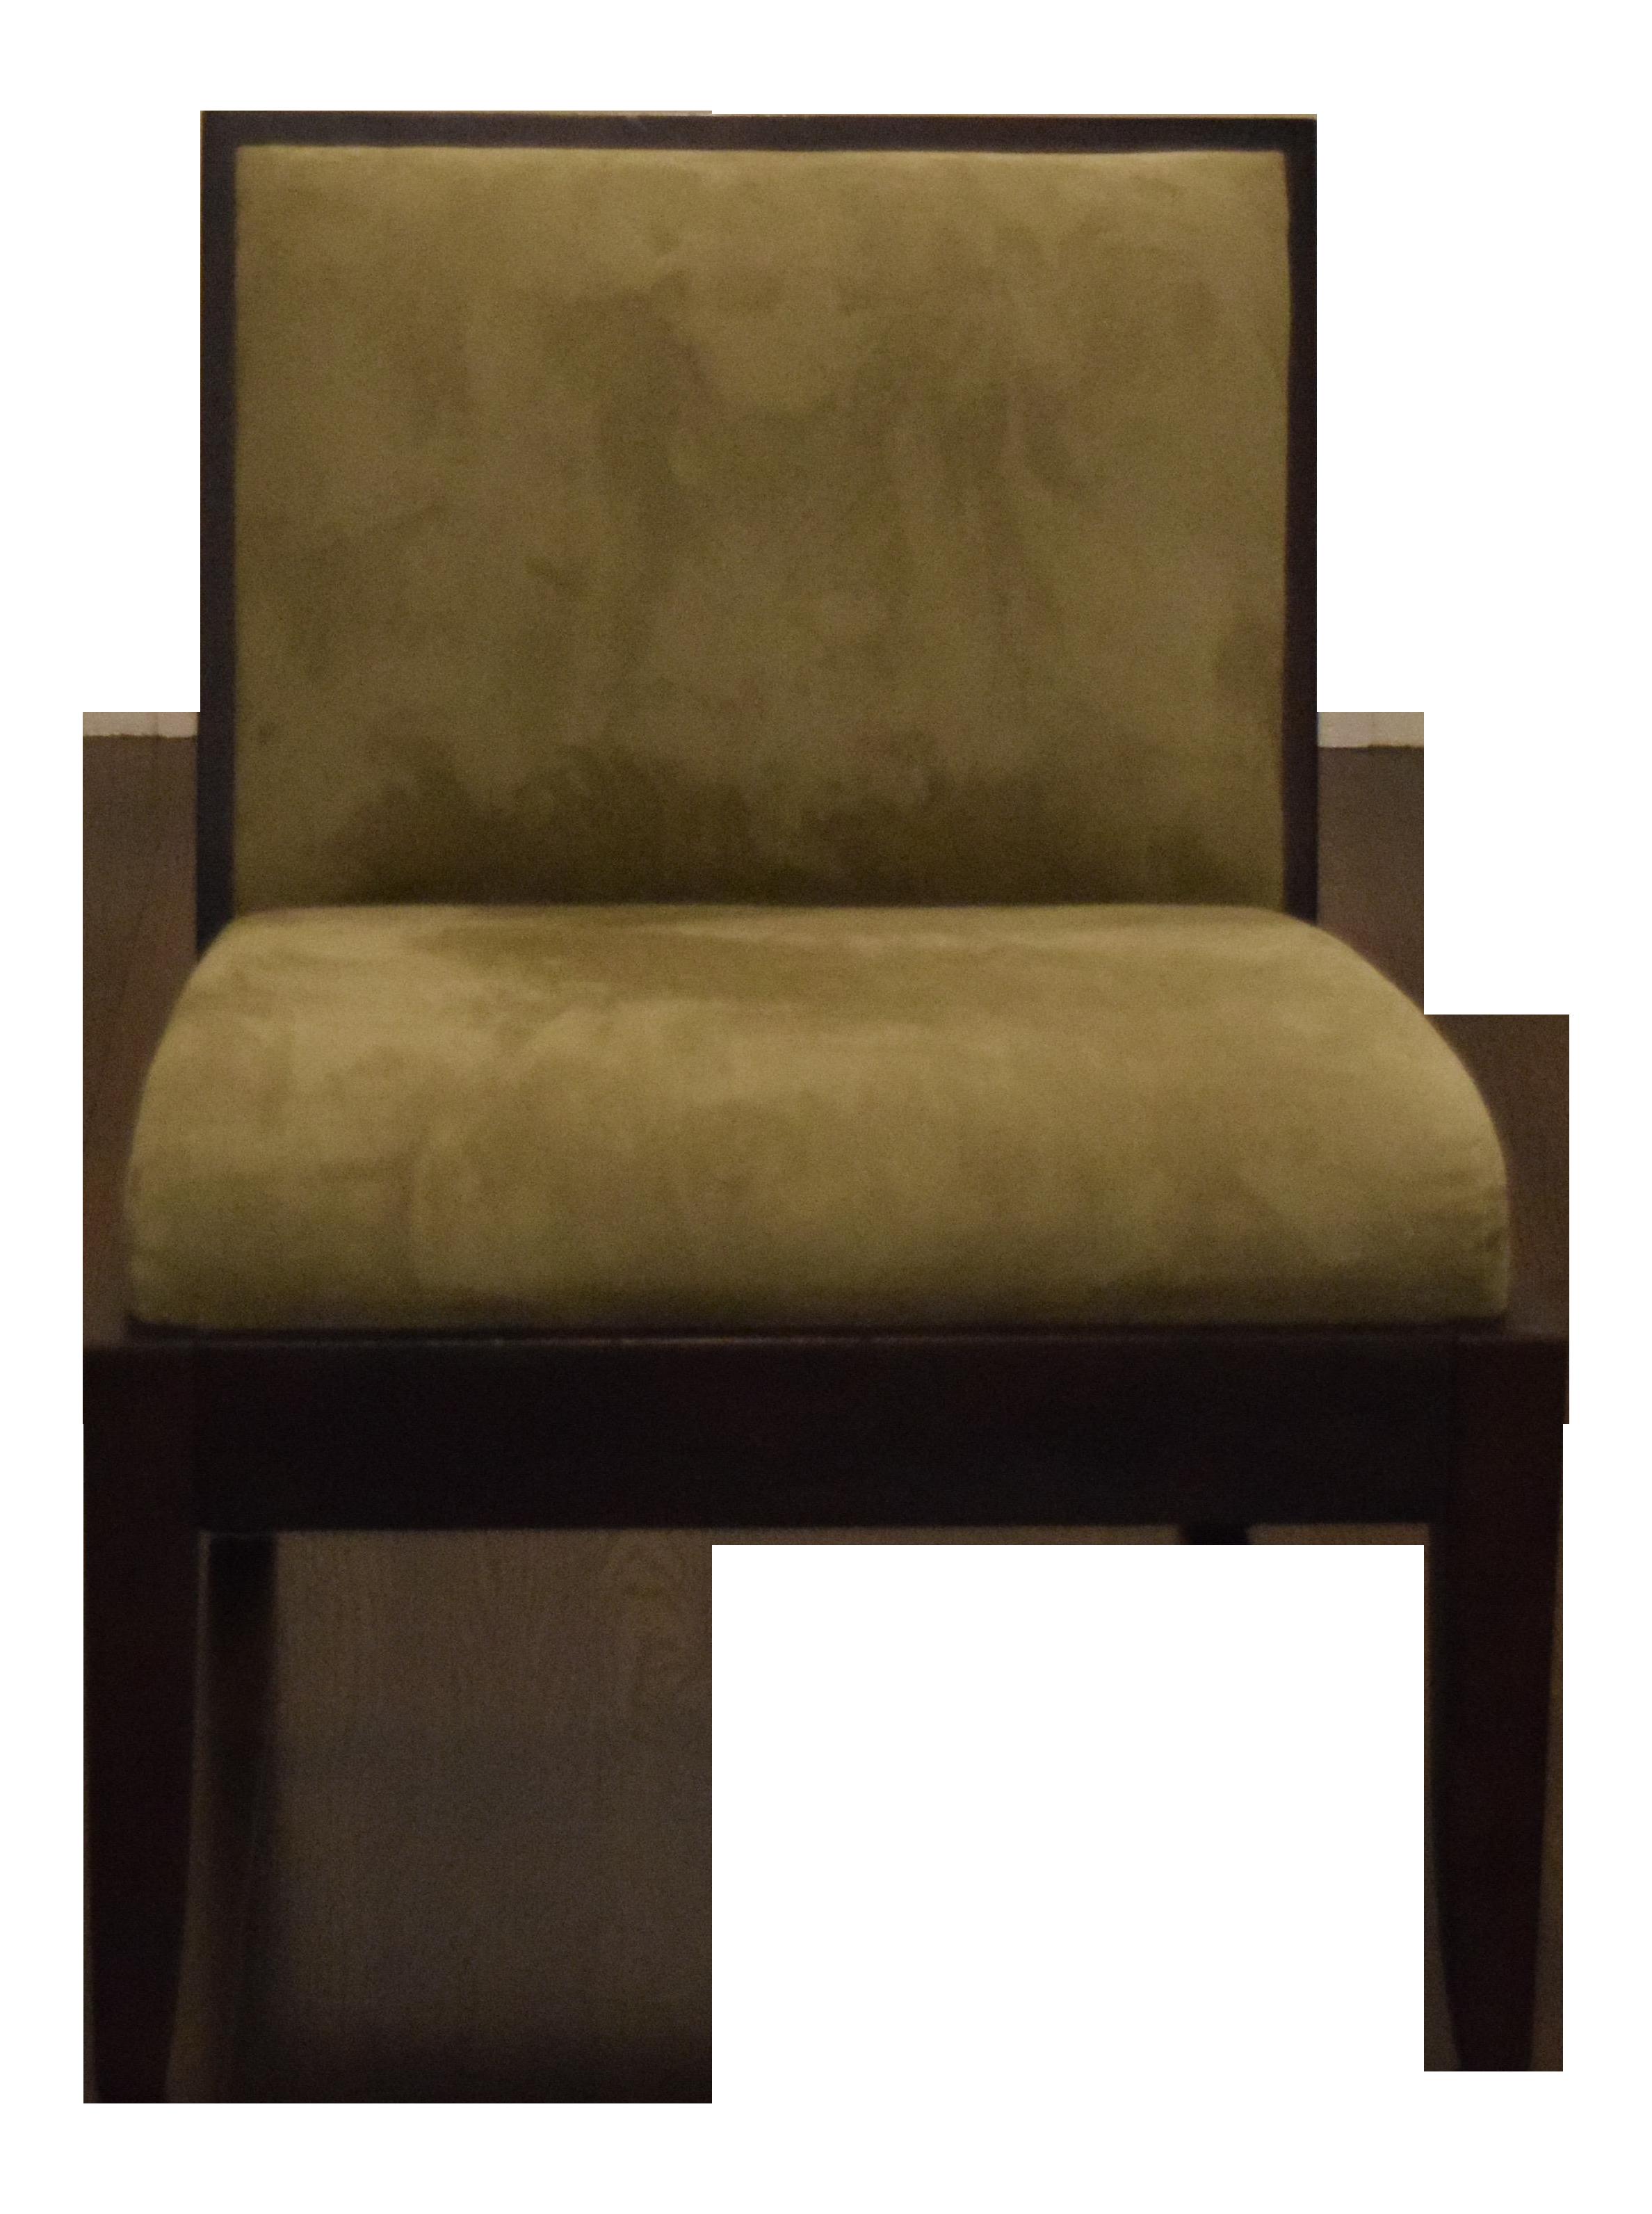 Crate Barrel Olive Green Slipper Chair Chairish